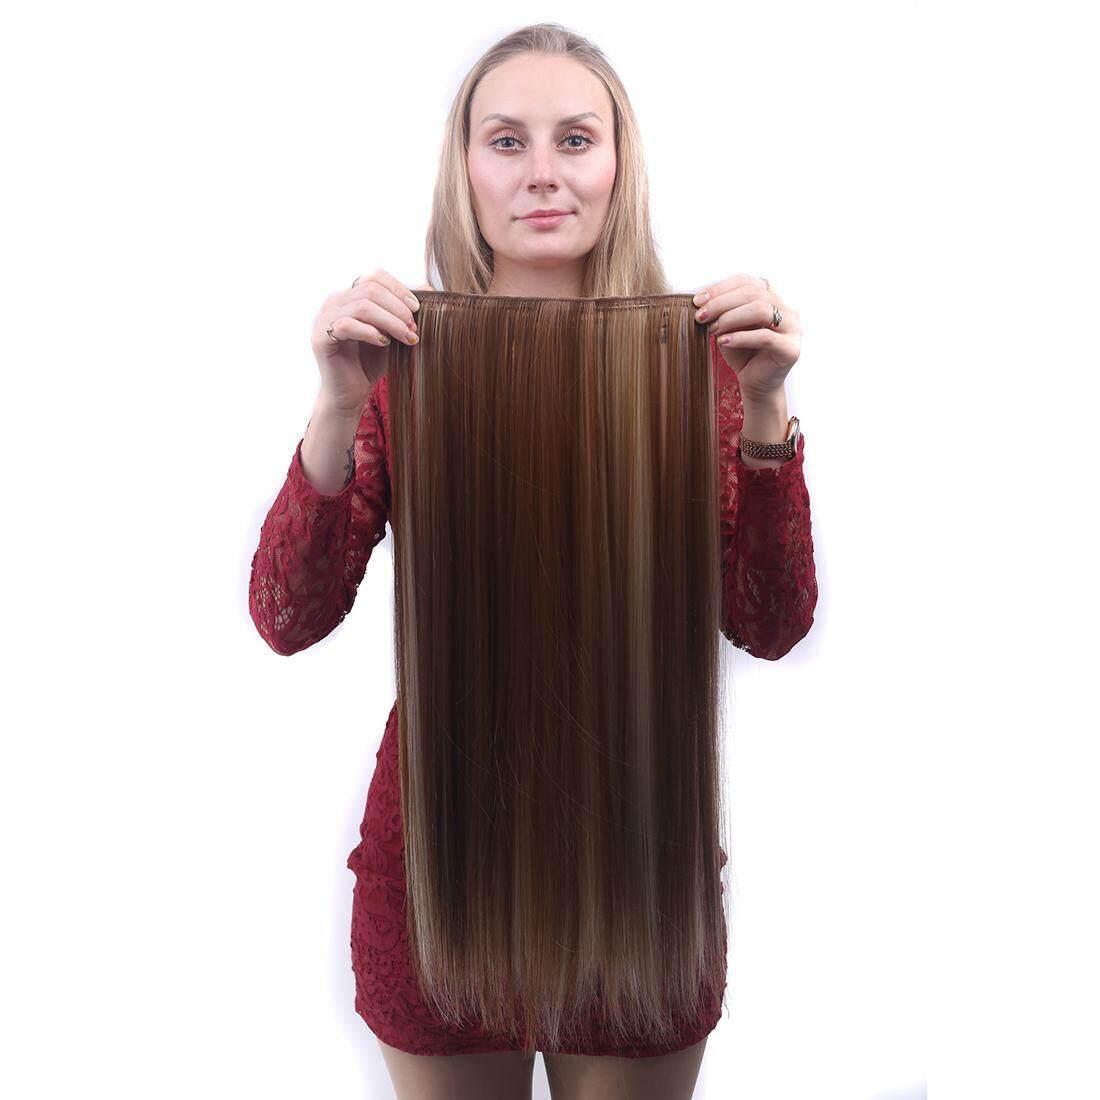 Flash Sale Pura-pura rambut lurus pinggir Bang sopak penuh poni sopak  kliphair extension di. Source · Eropa Panjang Wig Rambut Lurus Klip  Perempuan Ekstensi ... abe4e2d6e0